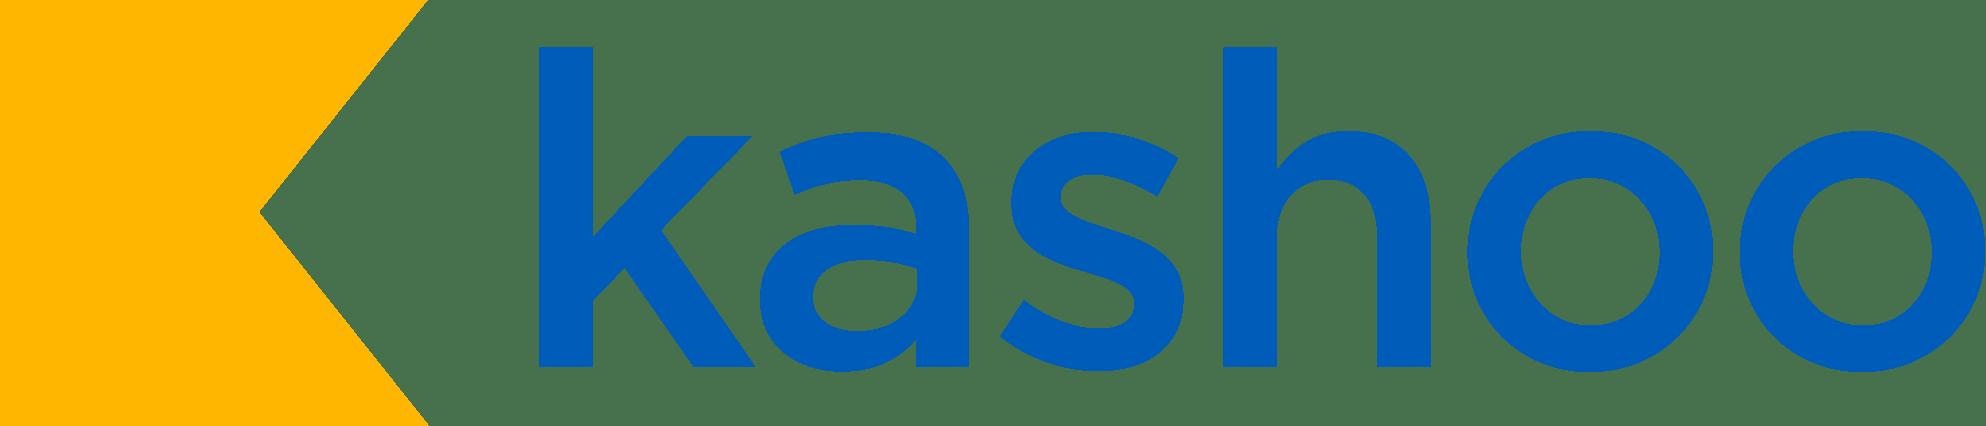 Kashoo Invoice and Accounting Software logo